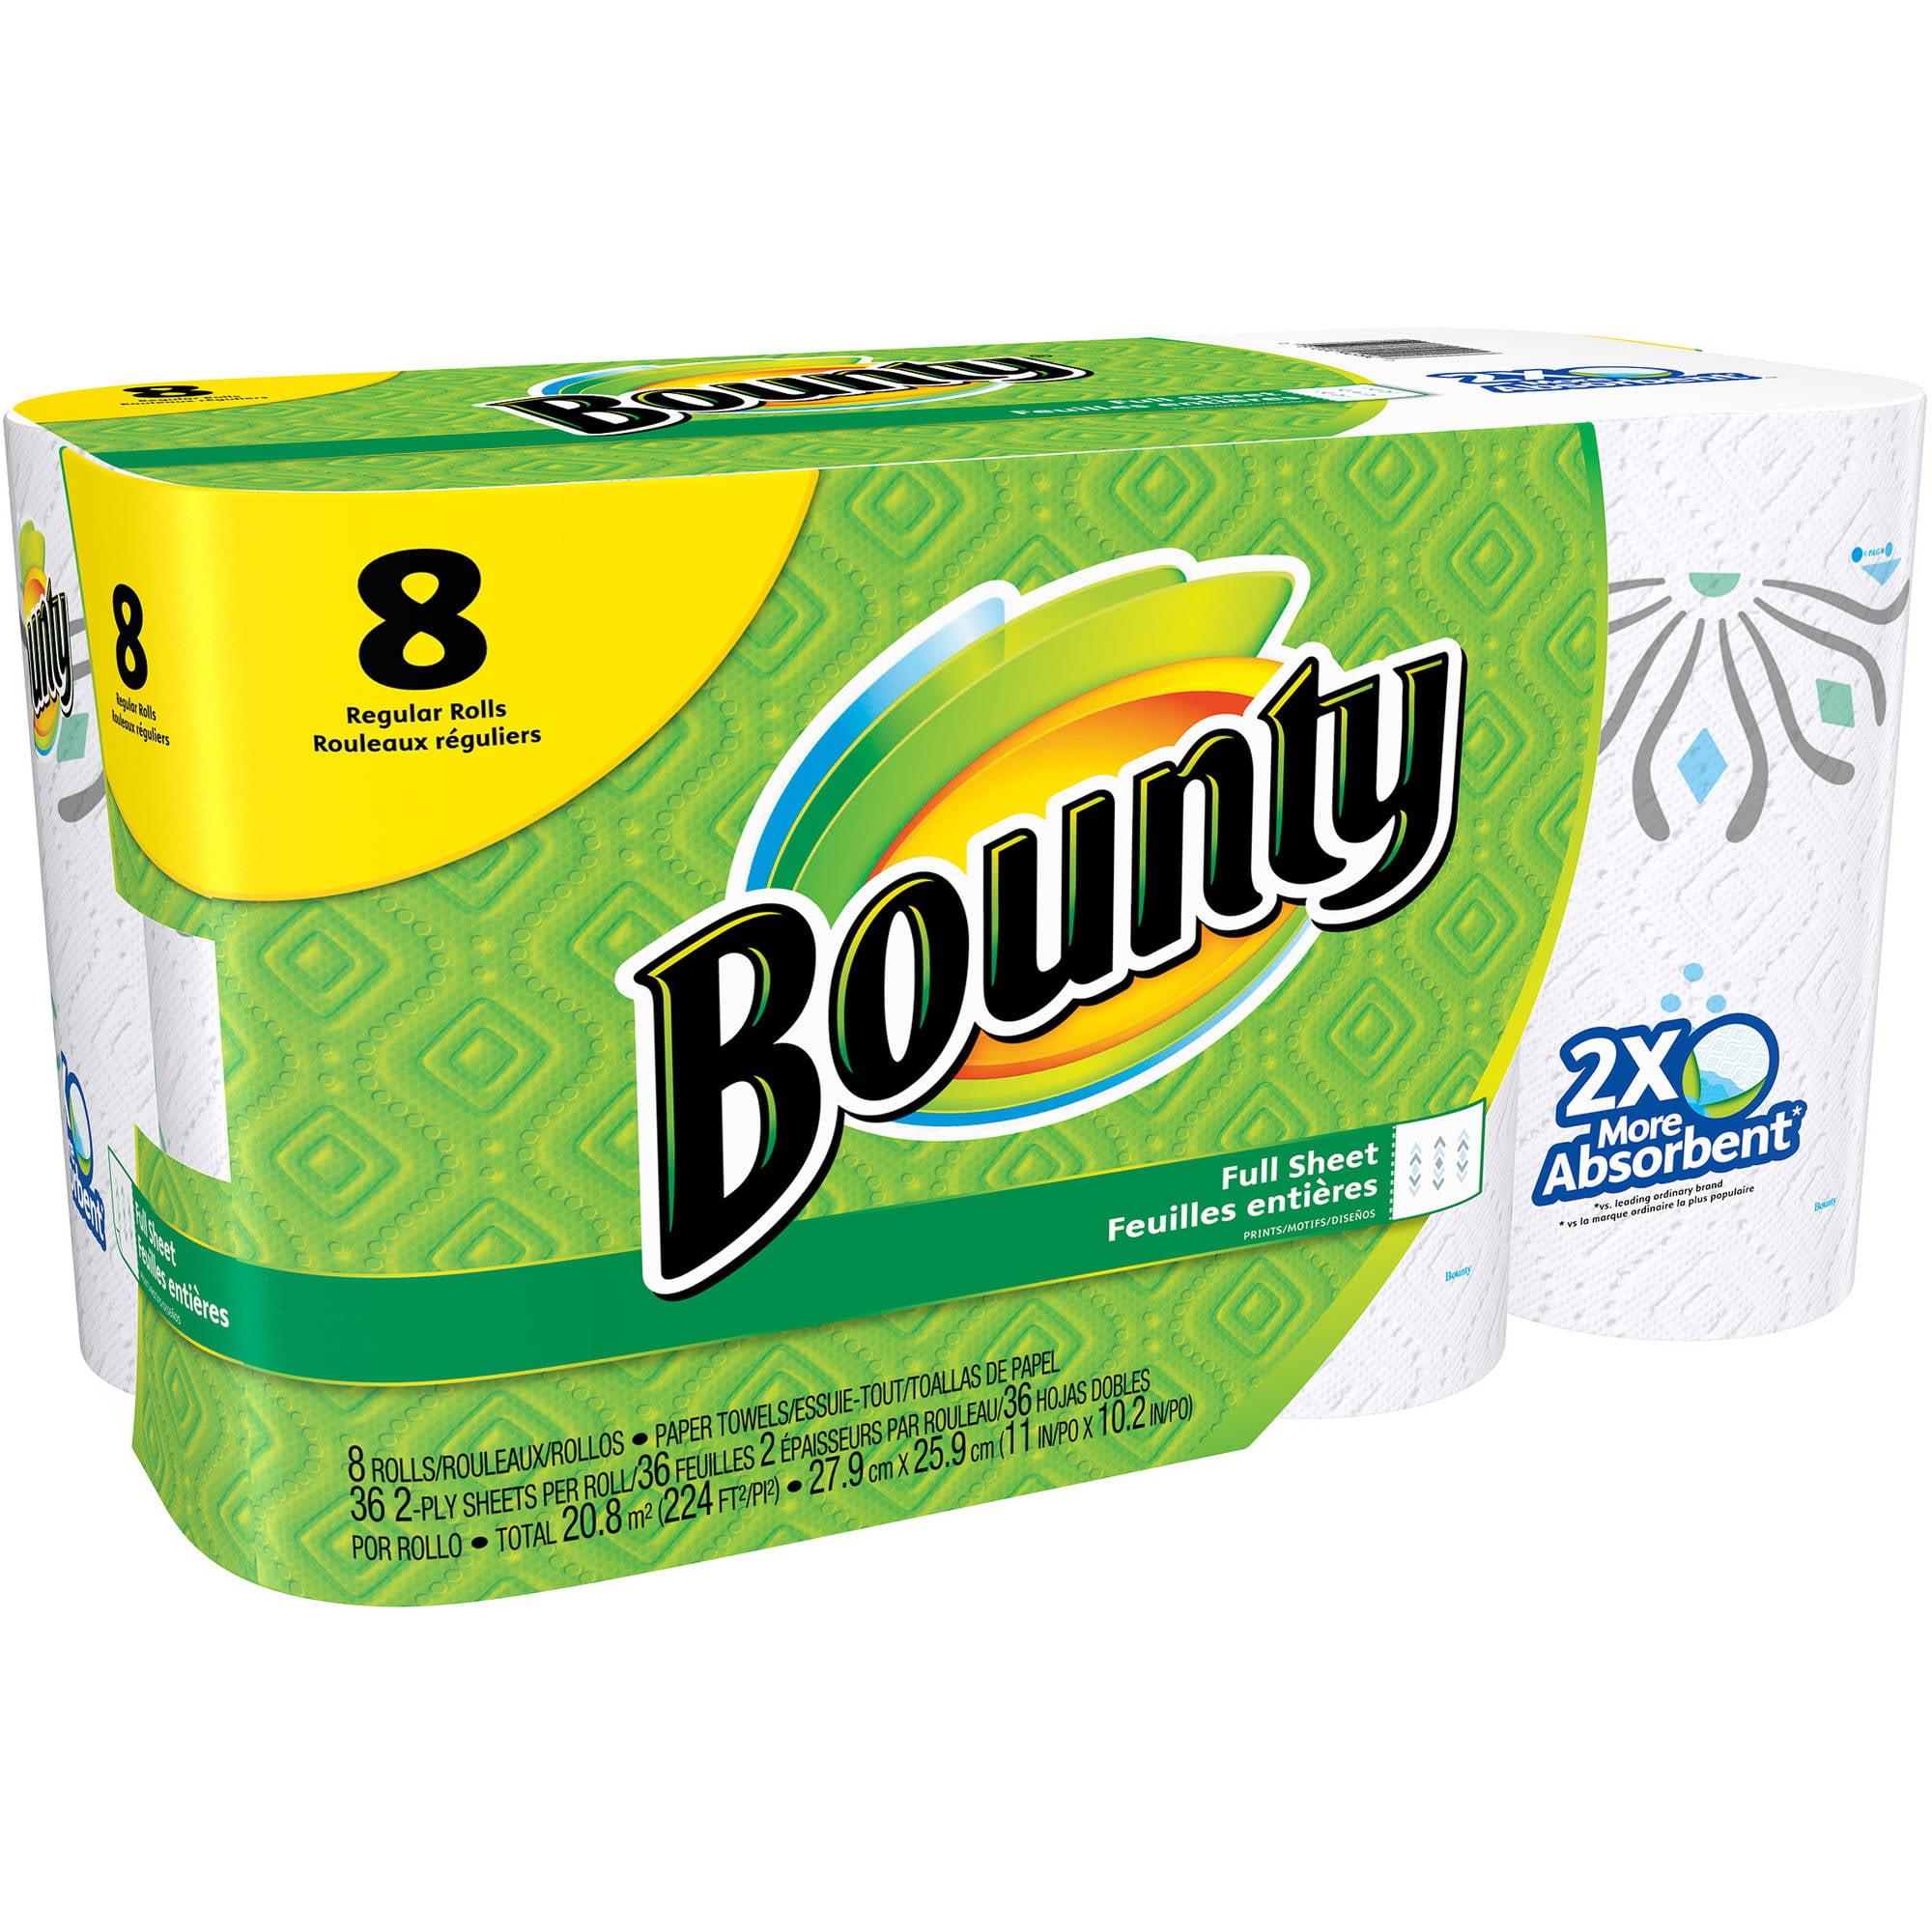 Bounty Regular Rolls Paper Towels, 36 sheets, 8 rolls